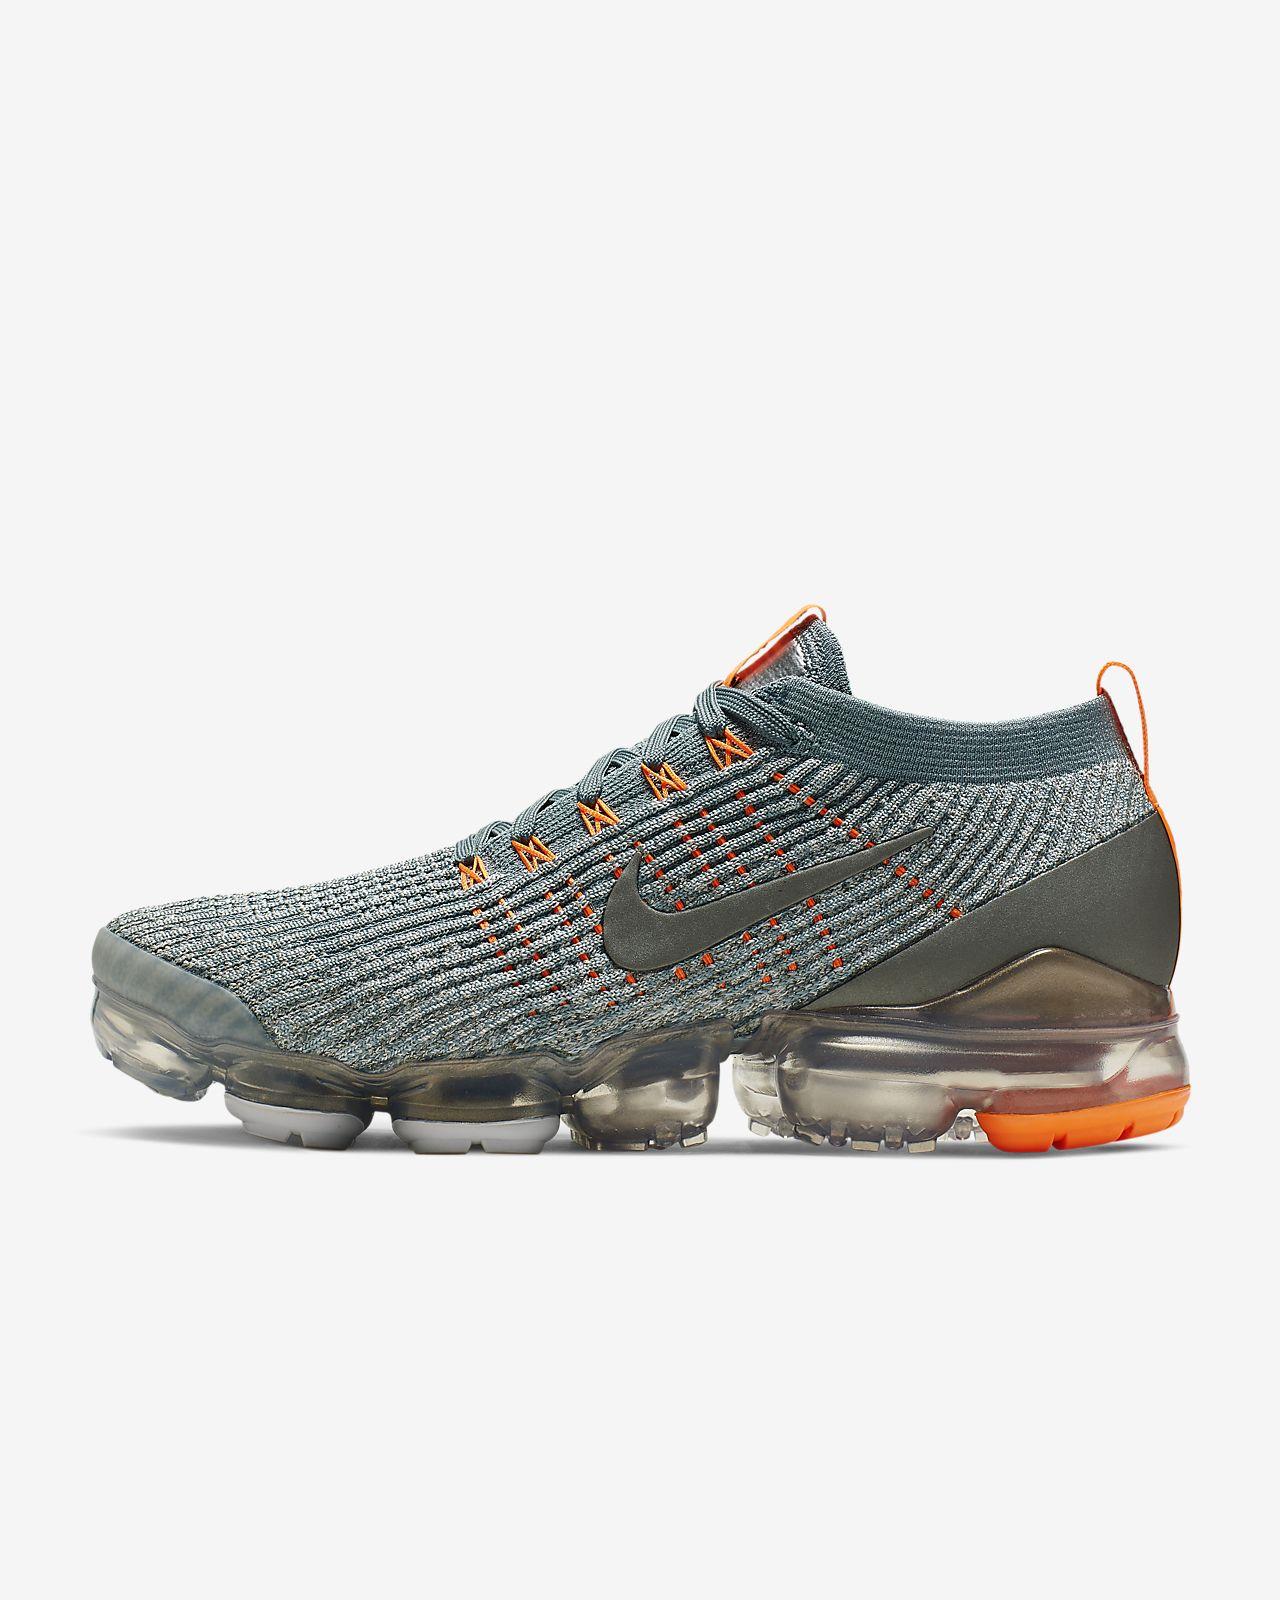 nike vapormax 2017 scarpe